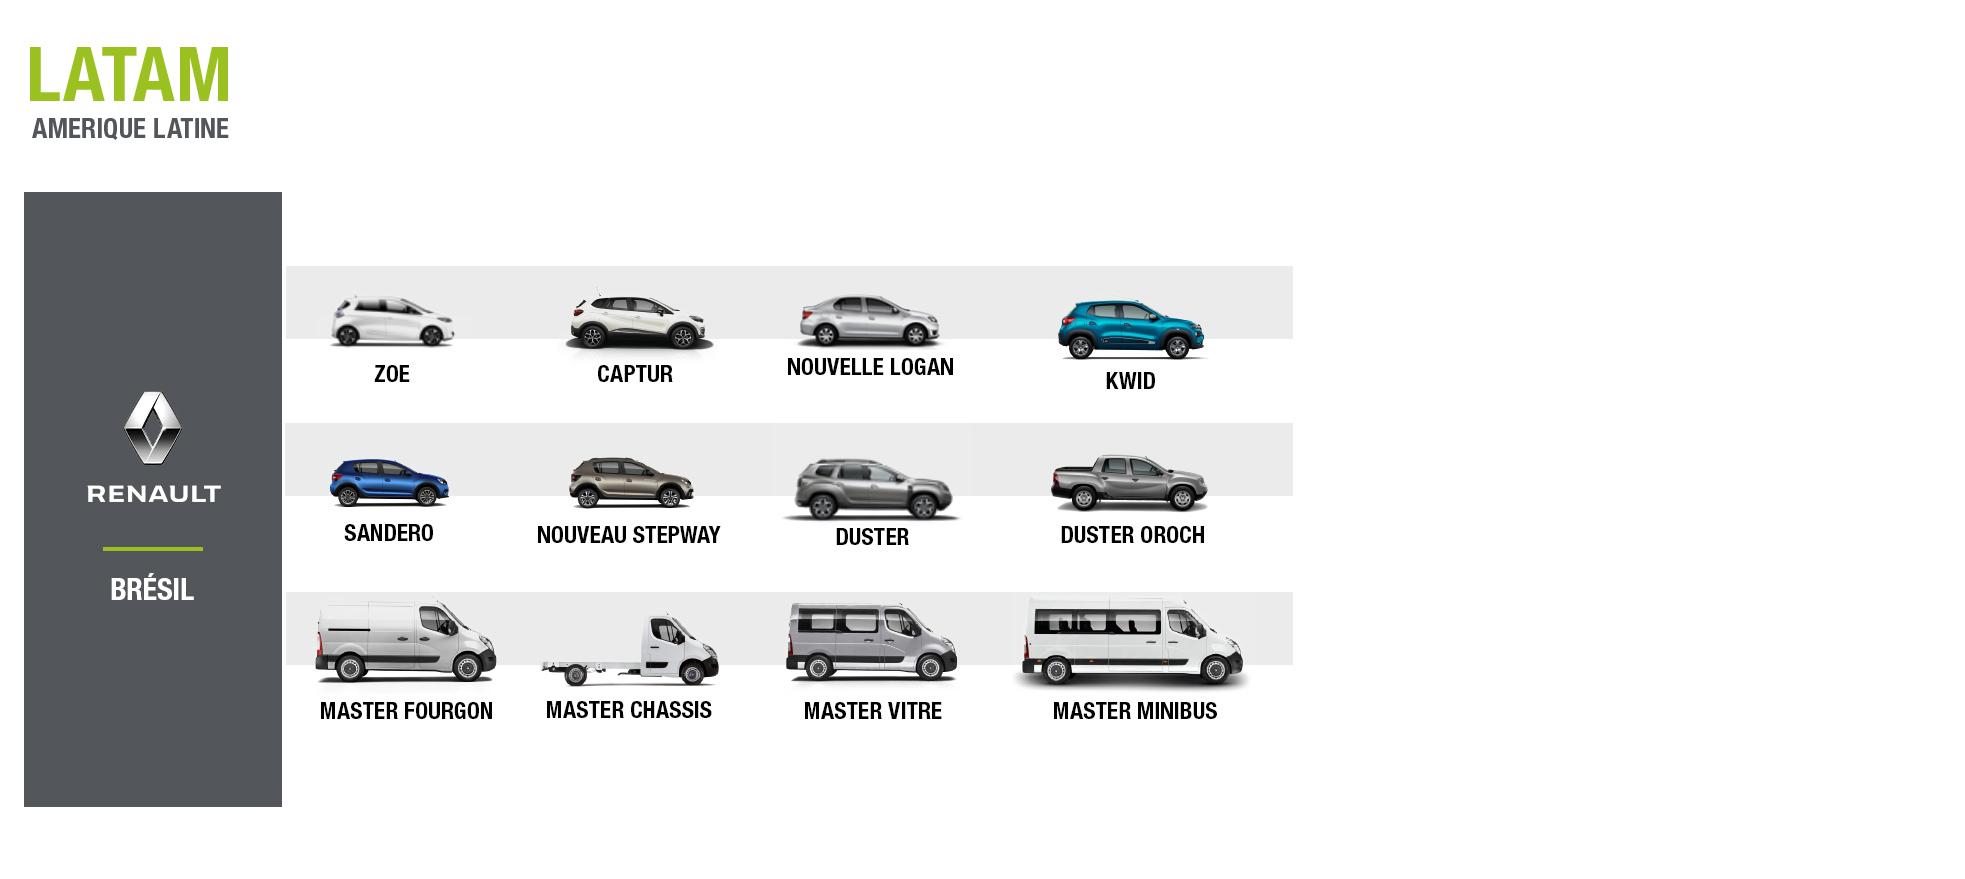 Renault fleet customer solutions véhicules Latam